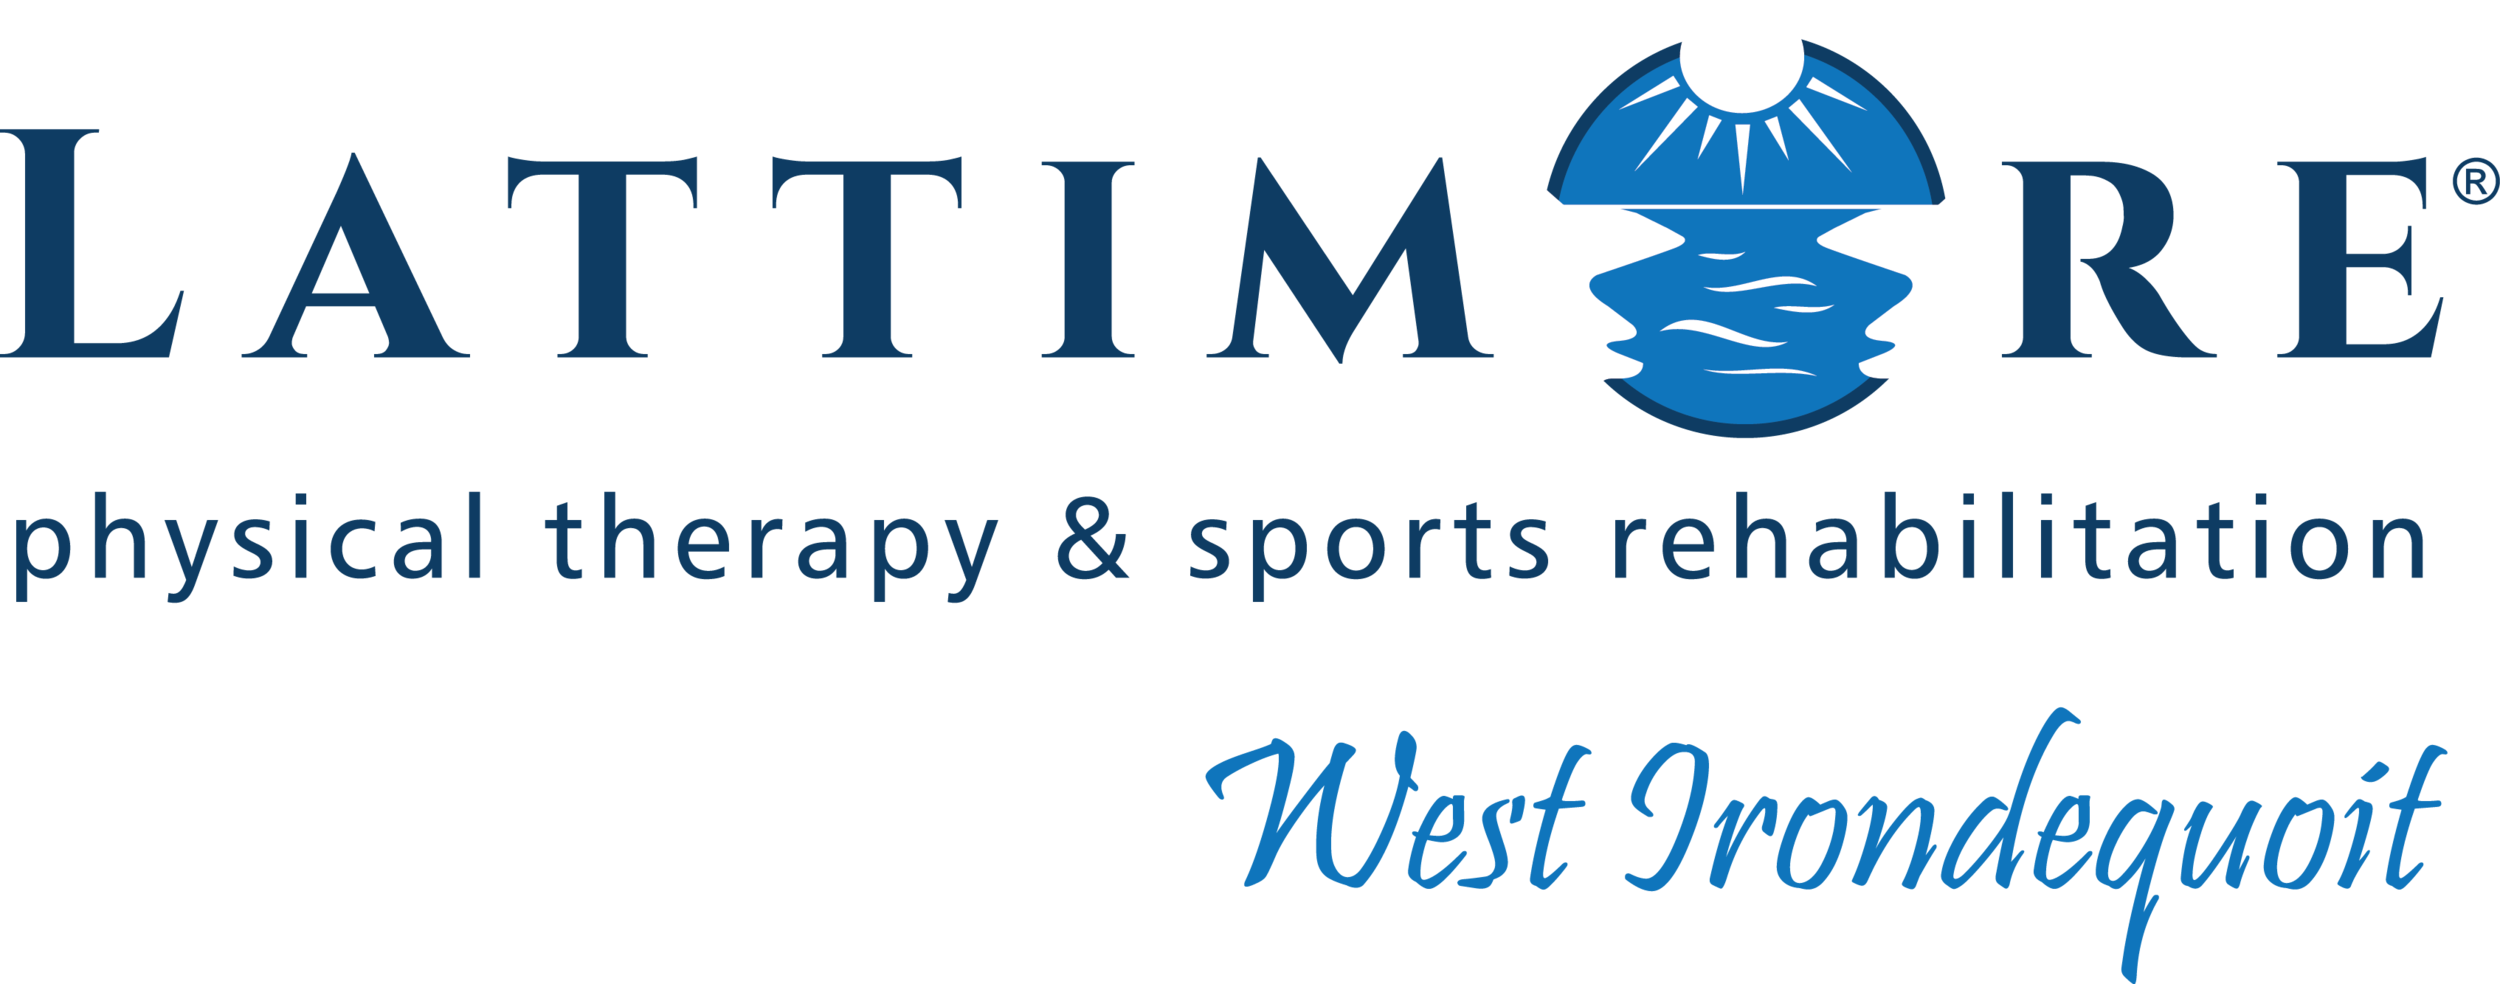 2019-05_Lattimore-Logo-West Irondequoit.png